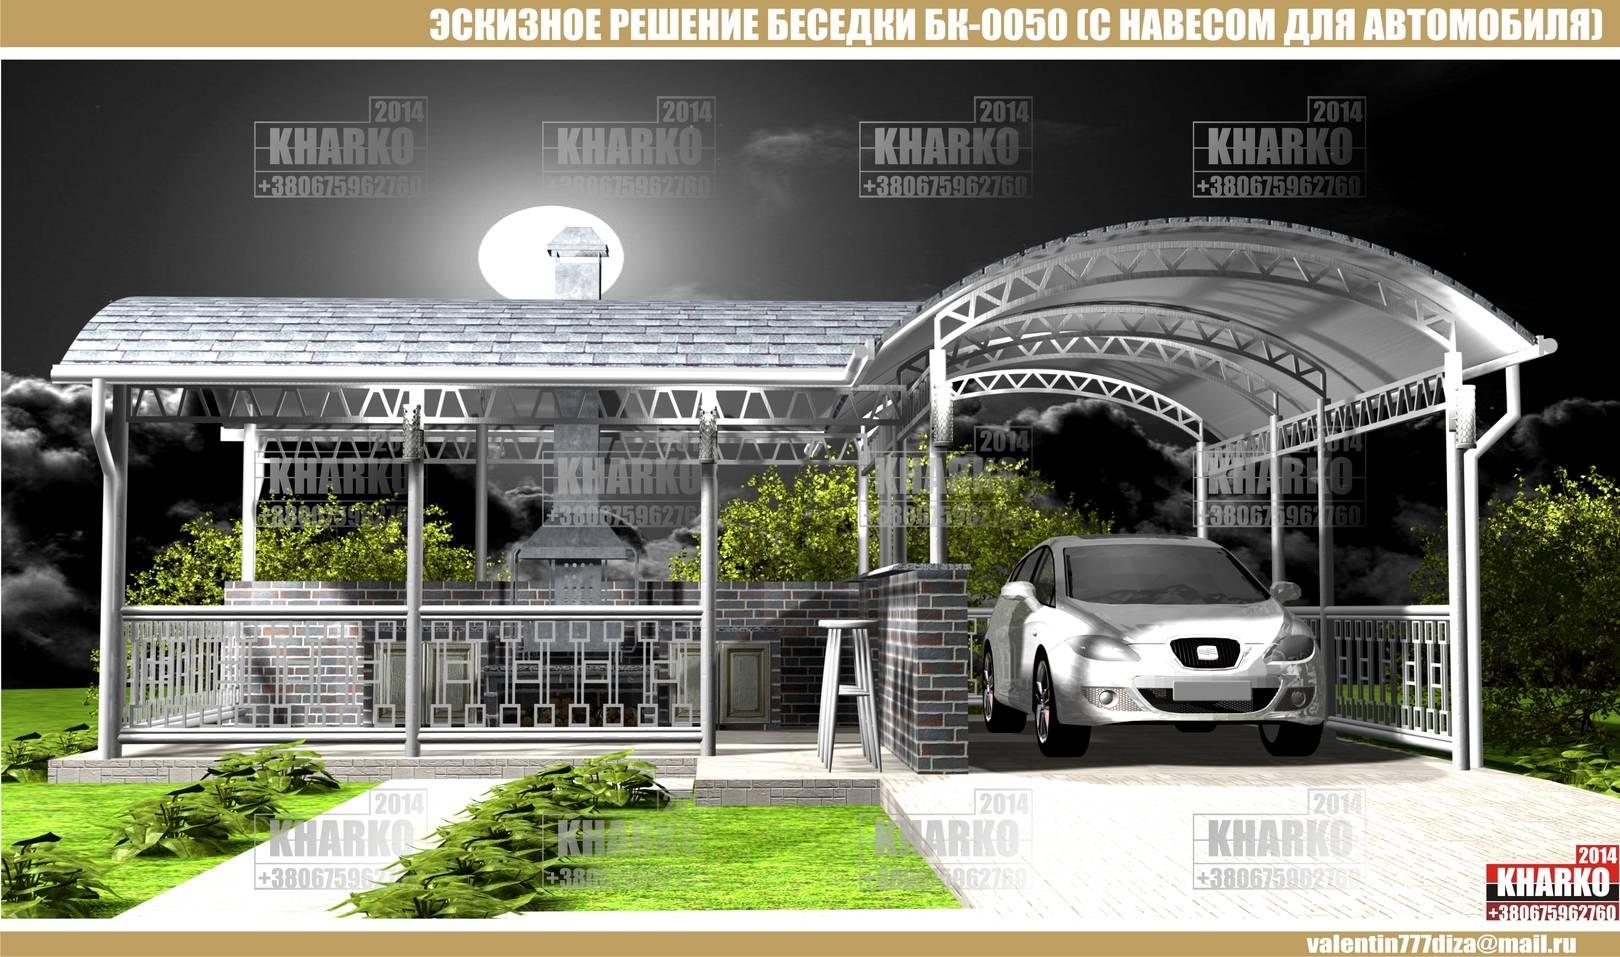 проект беседки БК-0050 (С навесом для автомобиля) , project pergola, gazebo, shed